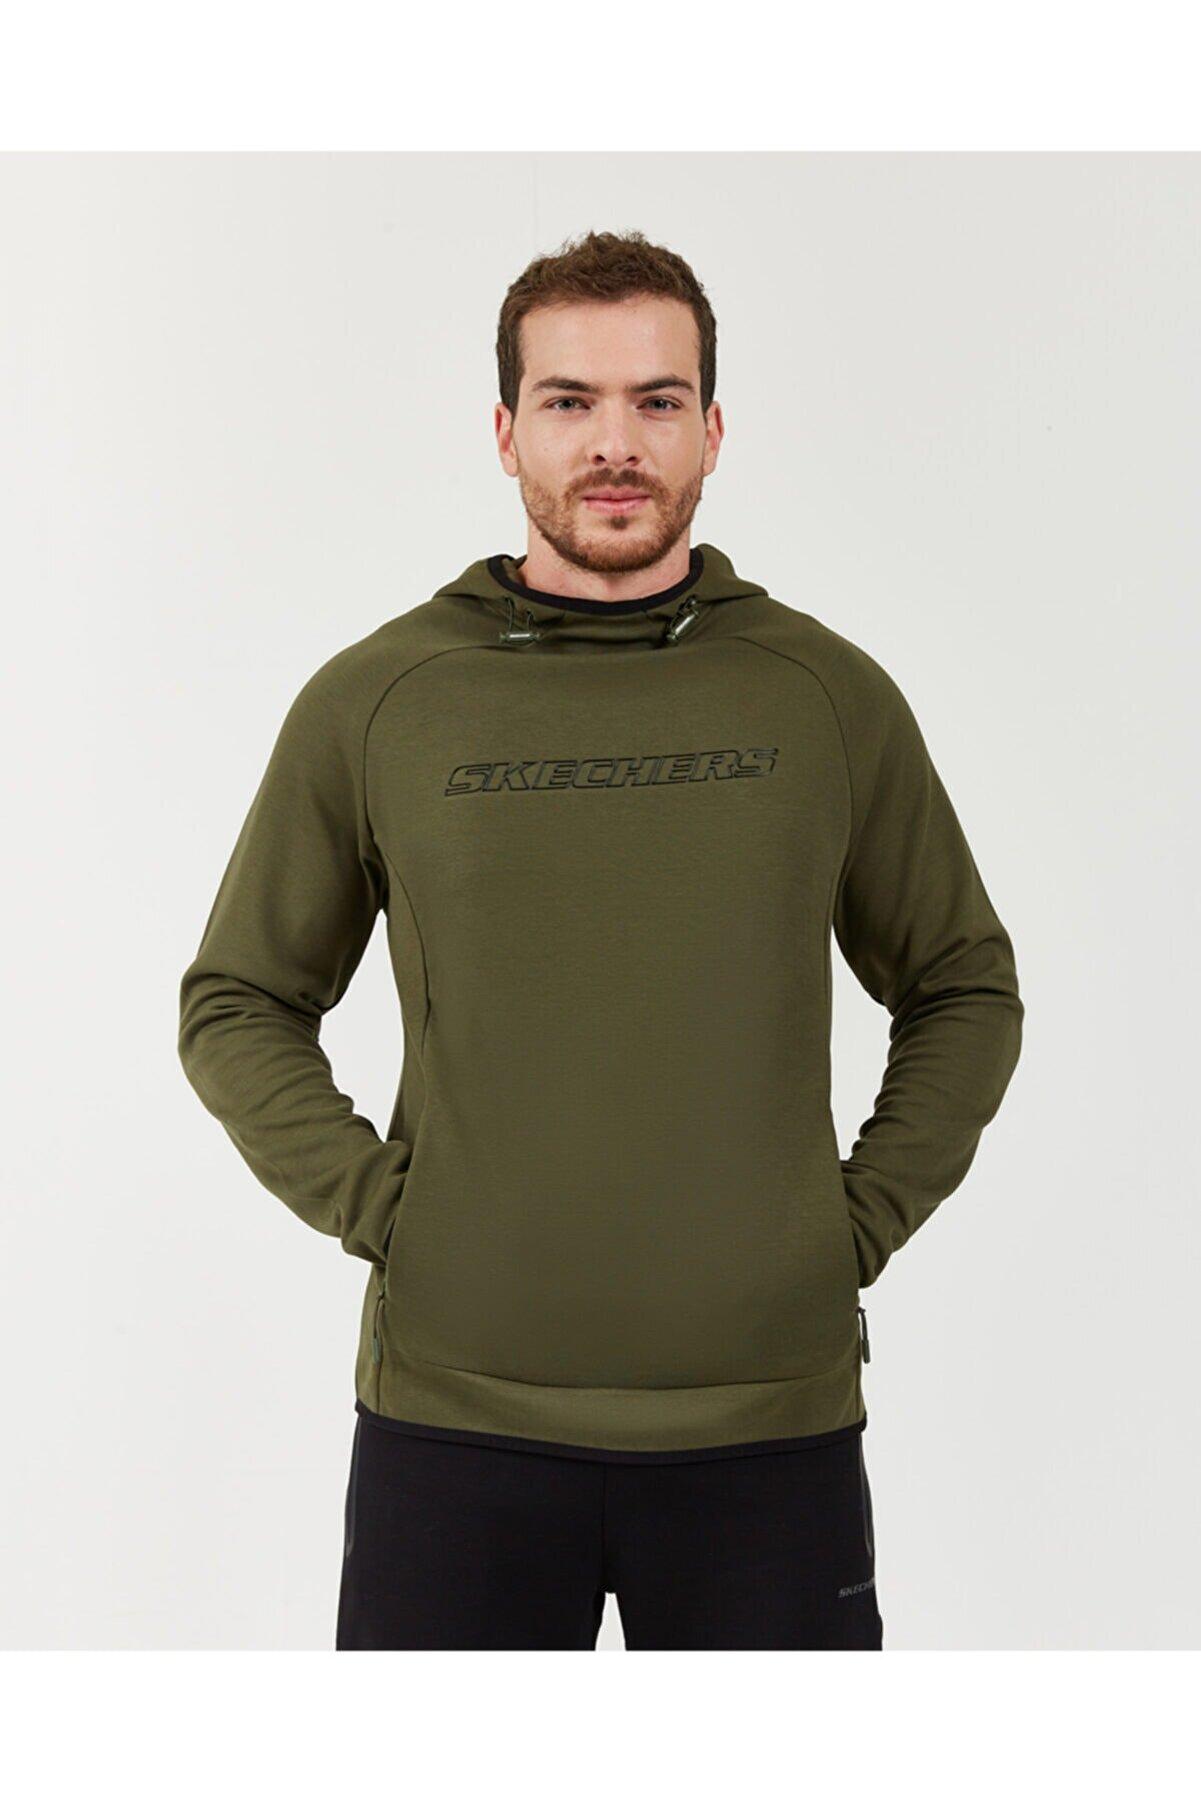 Skechers Erkek Haki Sweatshirt